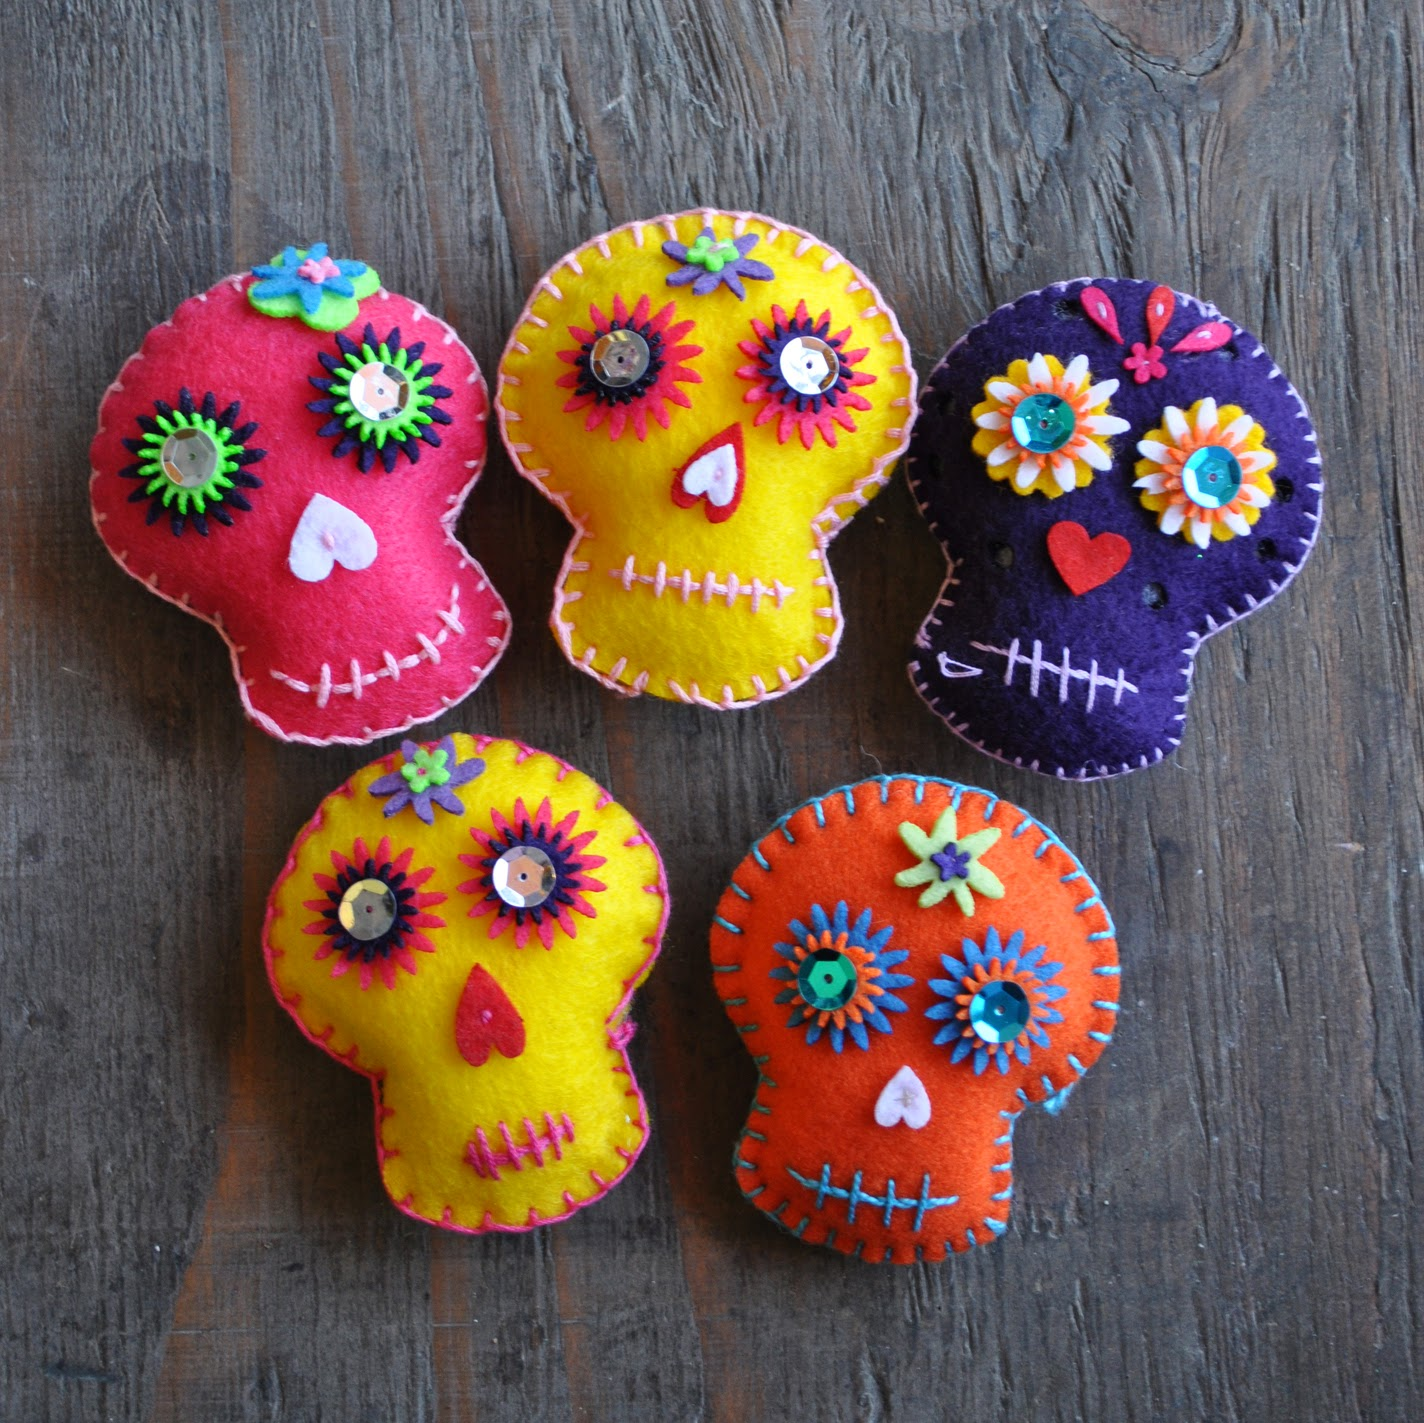 Different colored mini felt skull pillows